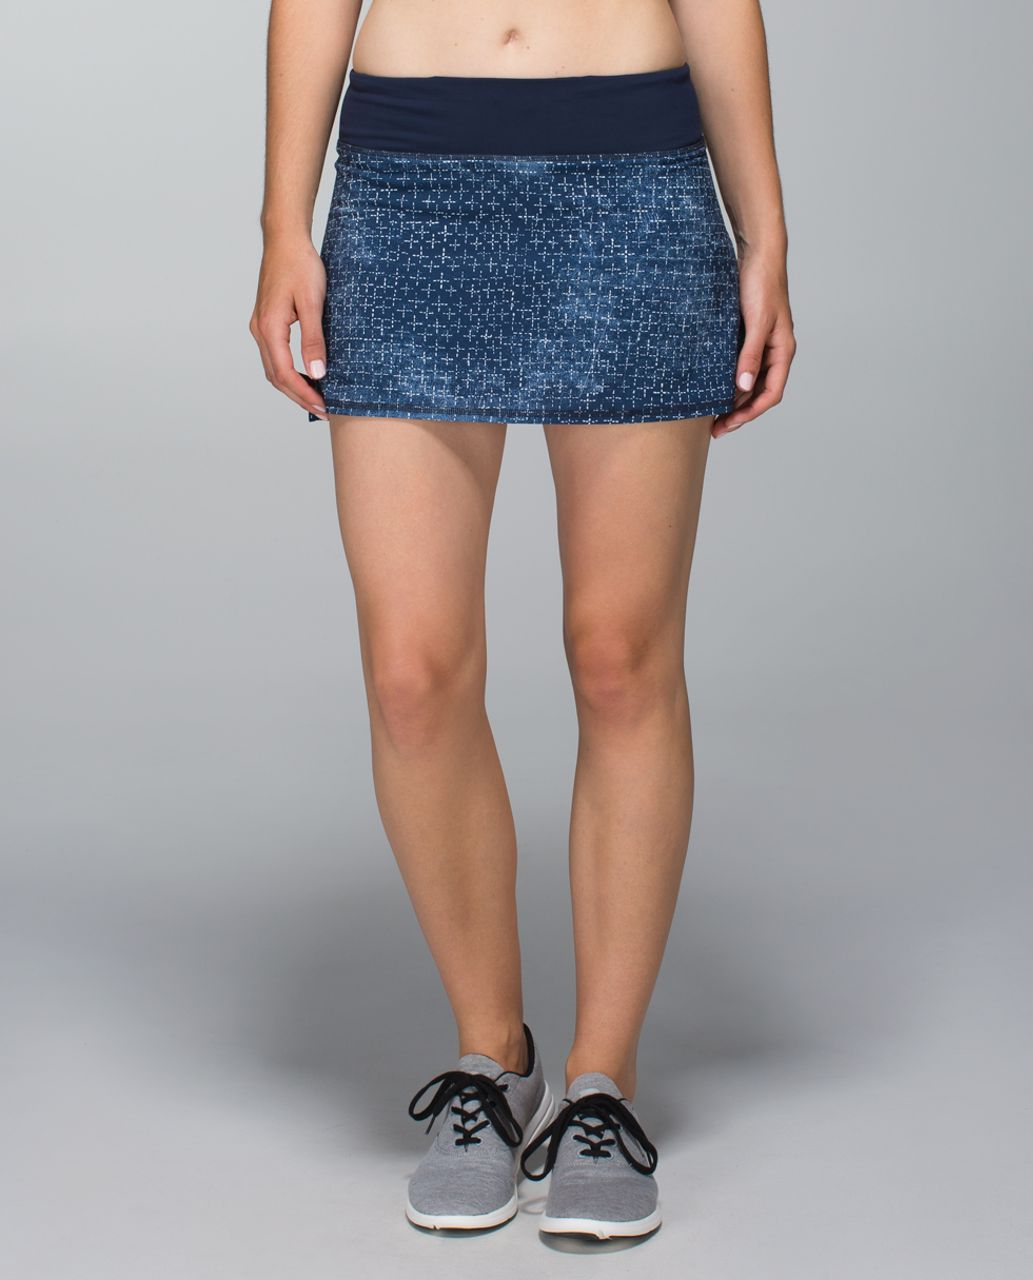 Lululemon Run:  Pace Setter Skirt *4-way Stretch (Regular) - Exploded Sashiko Cross Inkwell Ghost / Inkwell